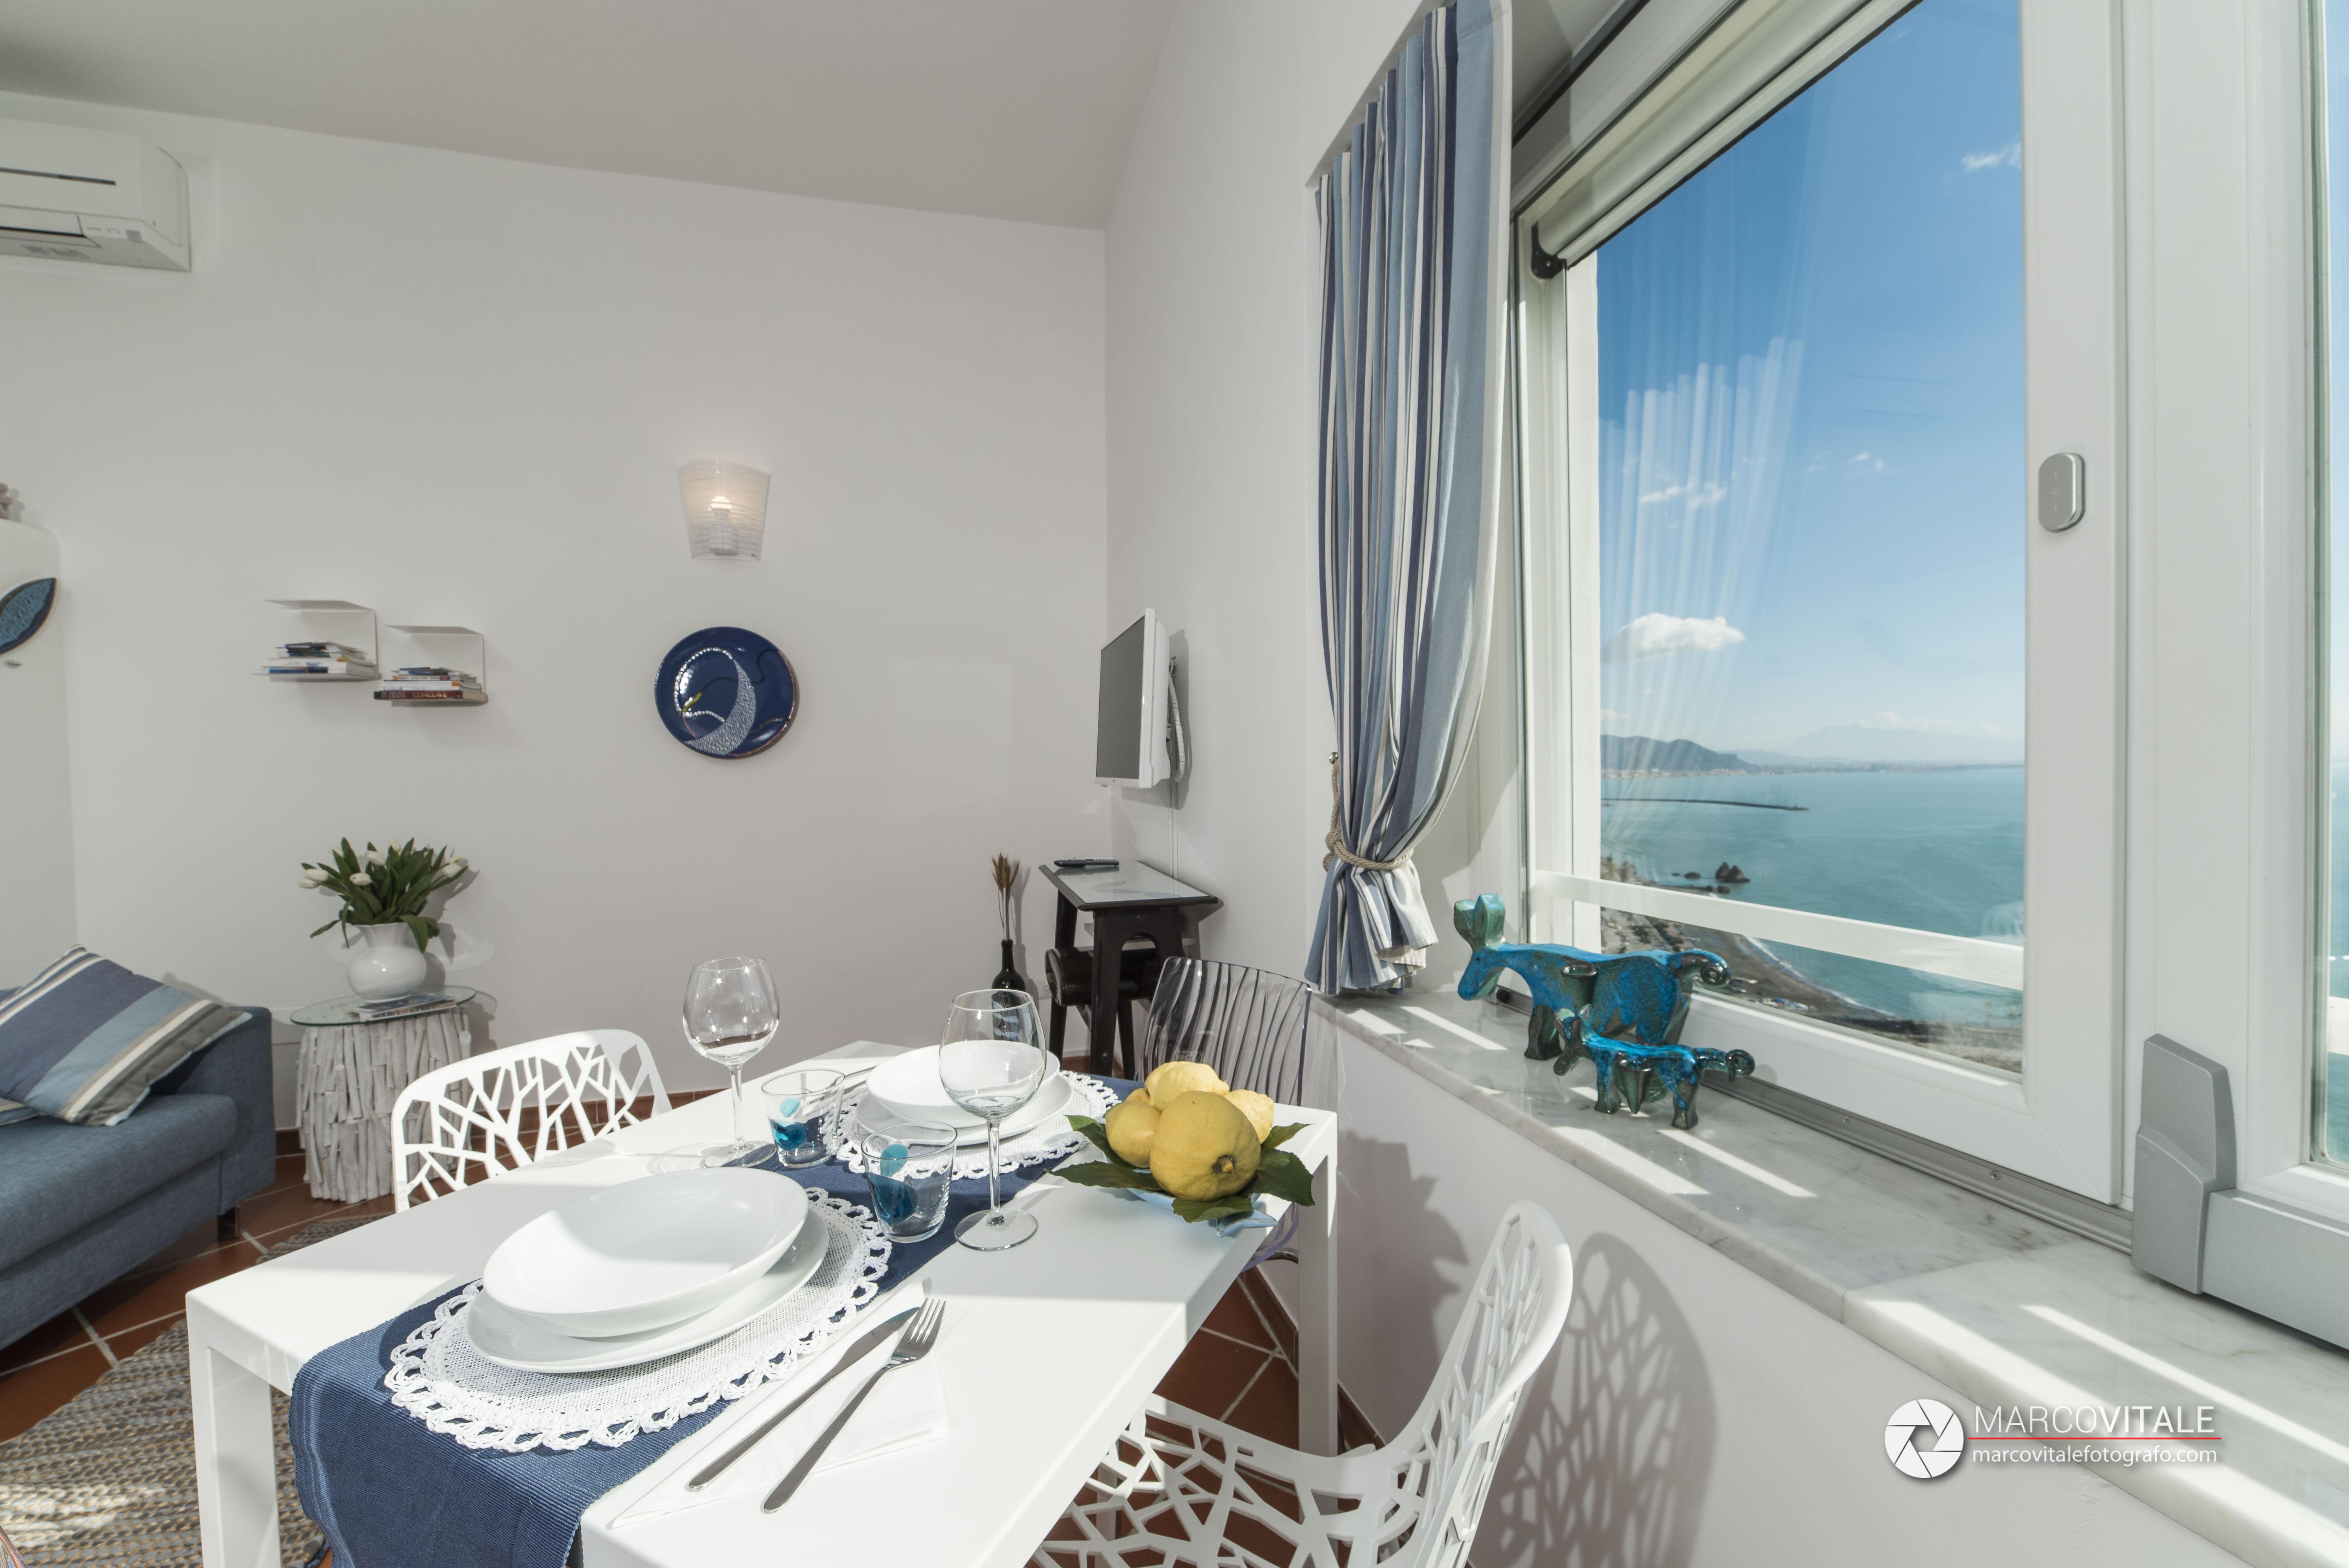 Fotografo di interni - Casa vacanze - Amalfi coast